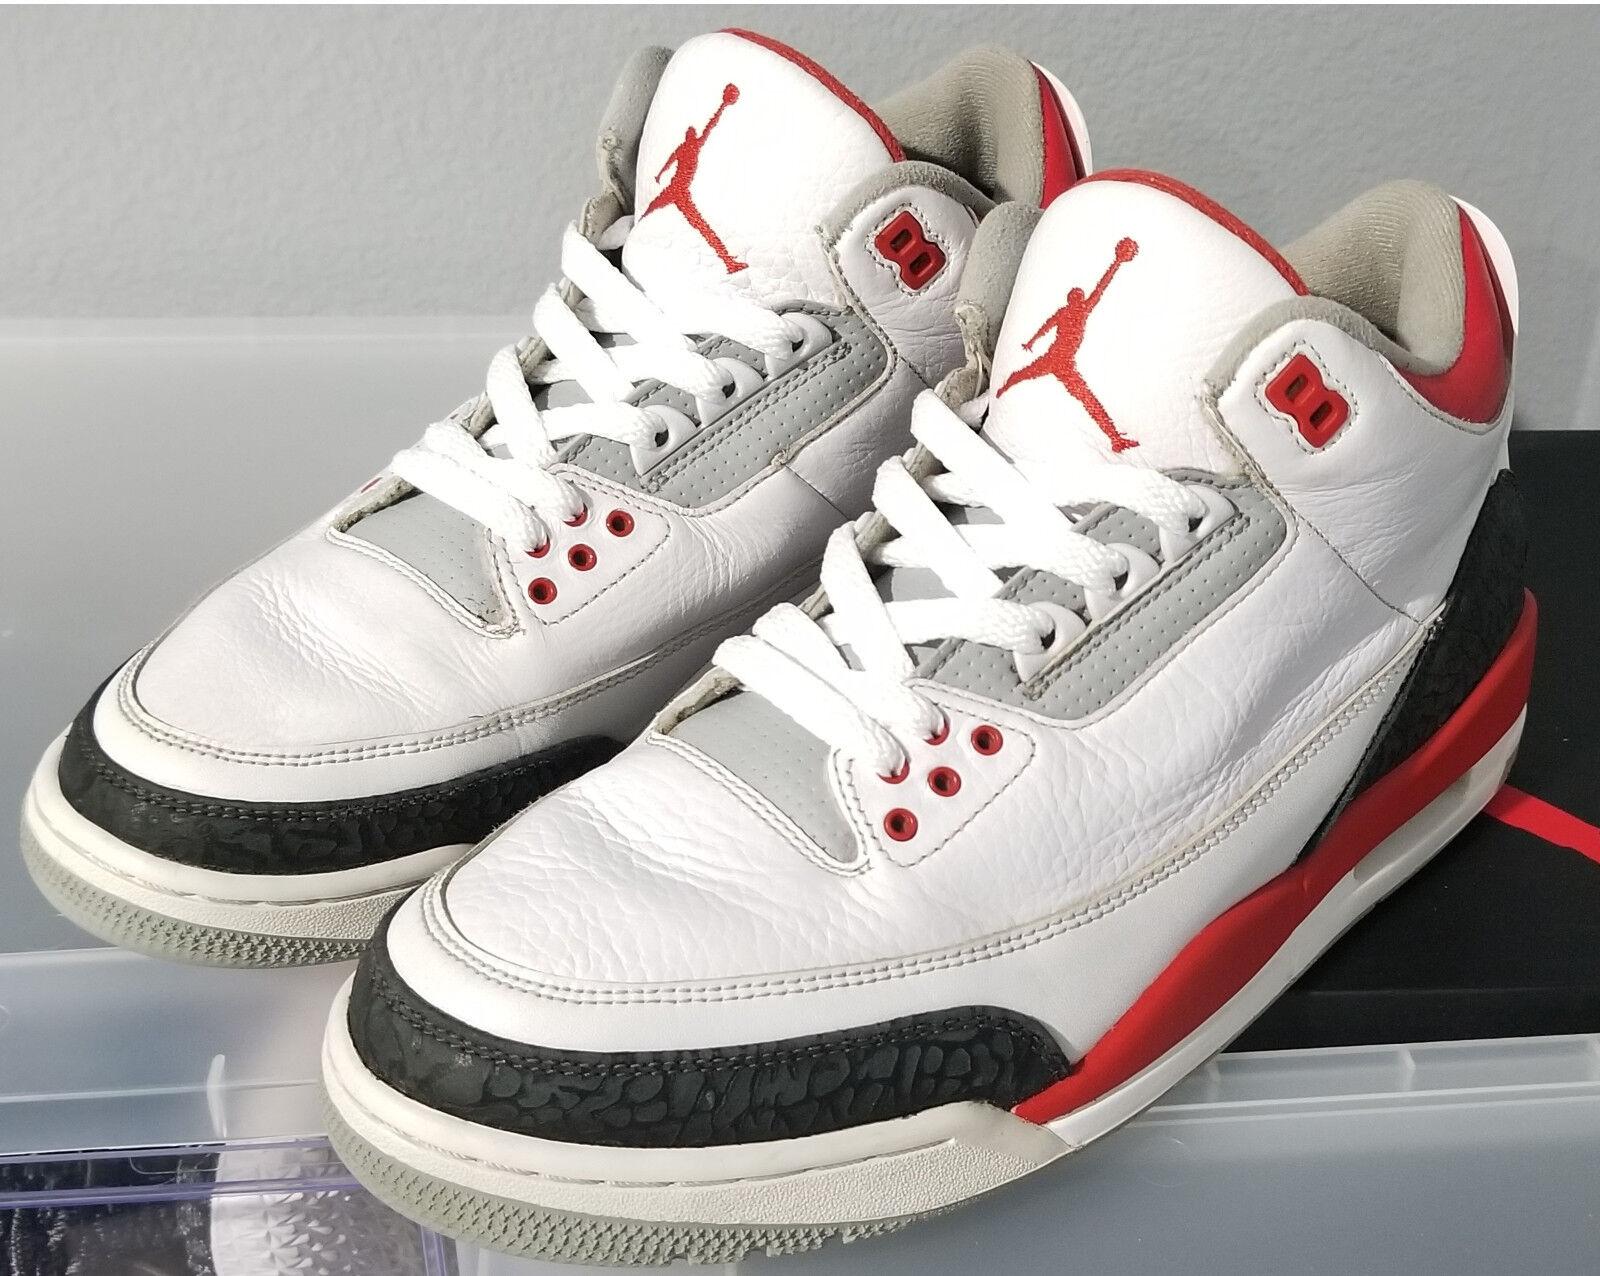 Nike Air Jordan blanco III 3 retro fuego blanco Jordan rojo negro gris cemento og 136064-120 f7ed88